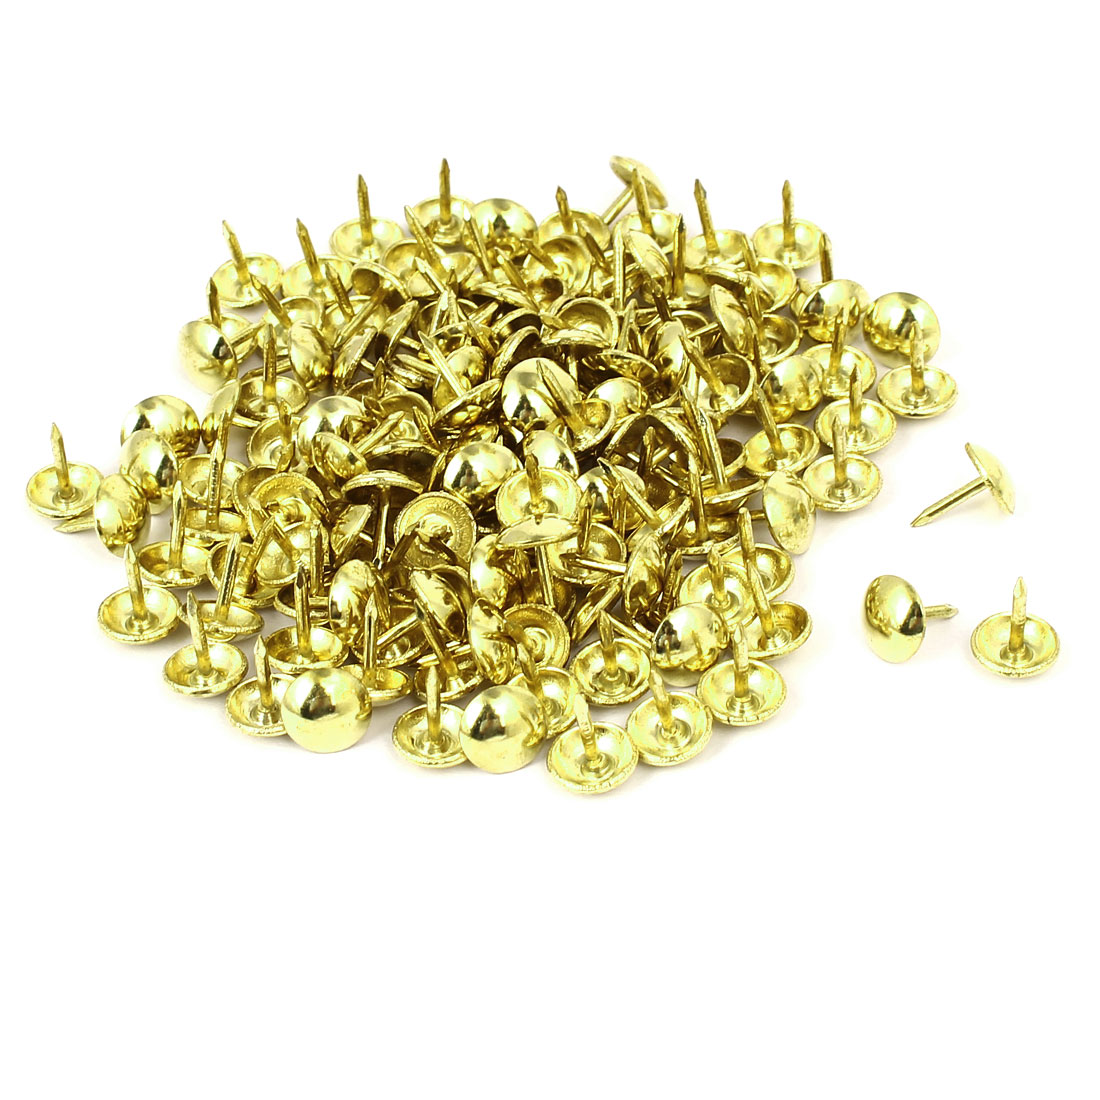 Home Furniture Upholstery Thumb Tack Nail Push Pin Gold Tone 9mm x 11mm 150pcs